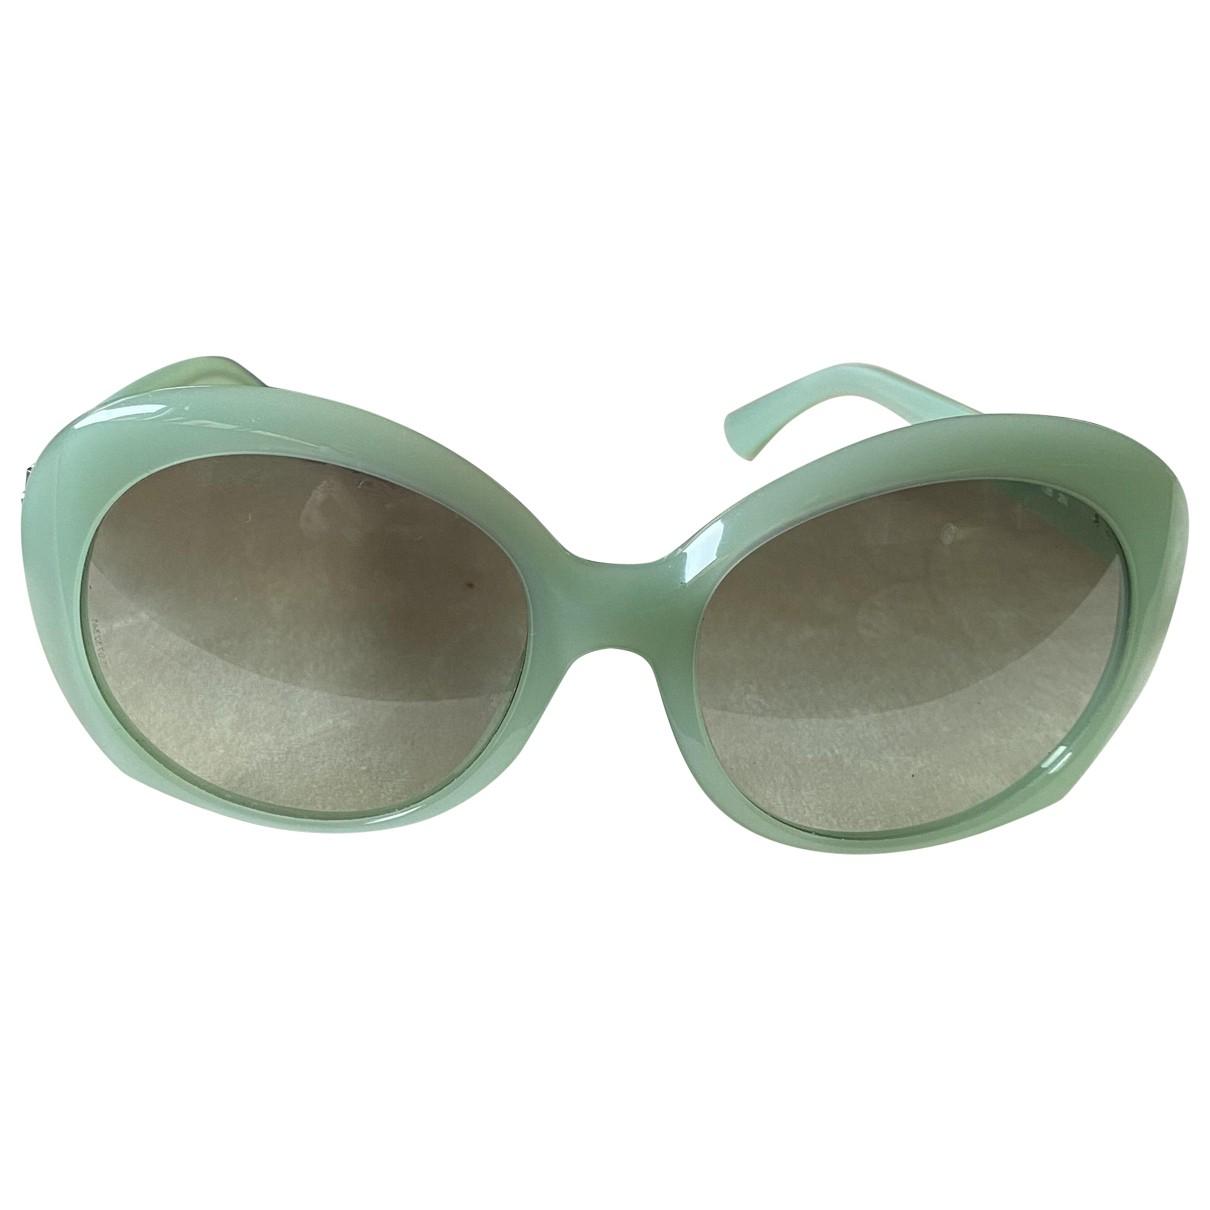 Emporio Armani \N Turquoise Sunglasses for Women \N